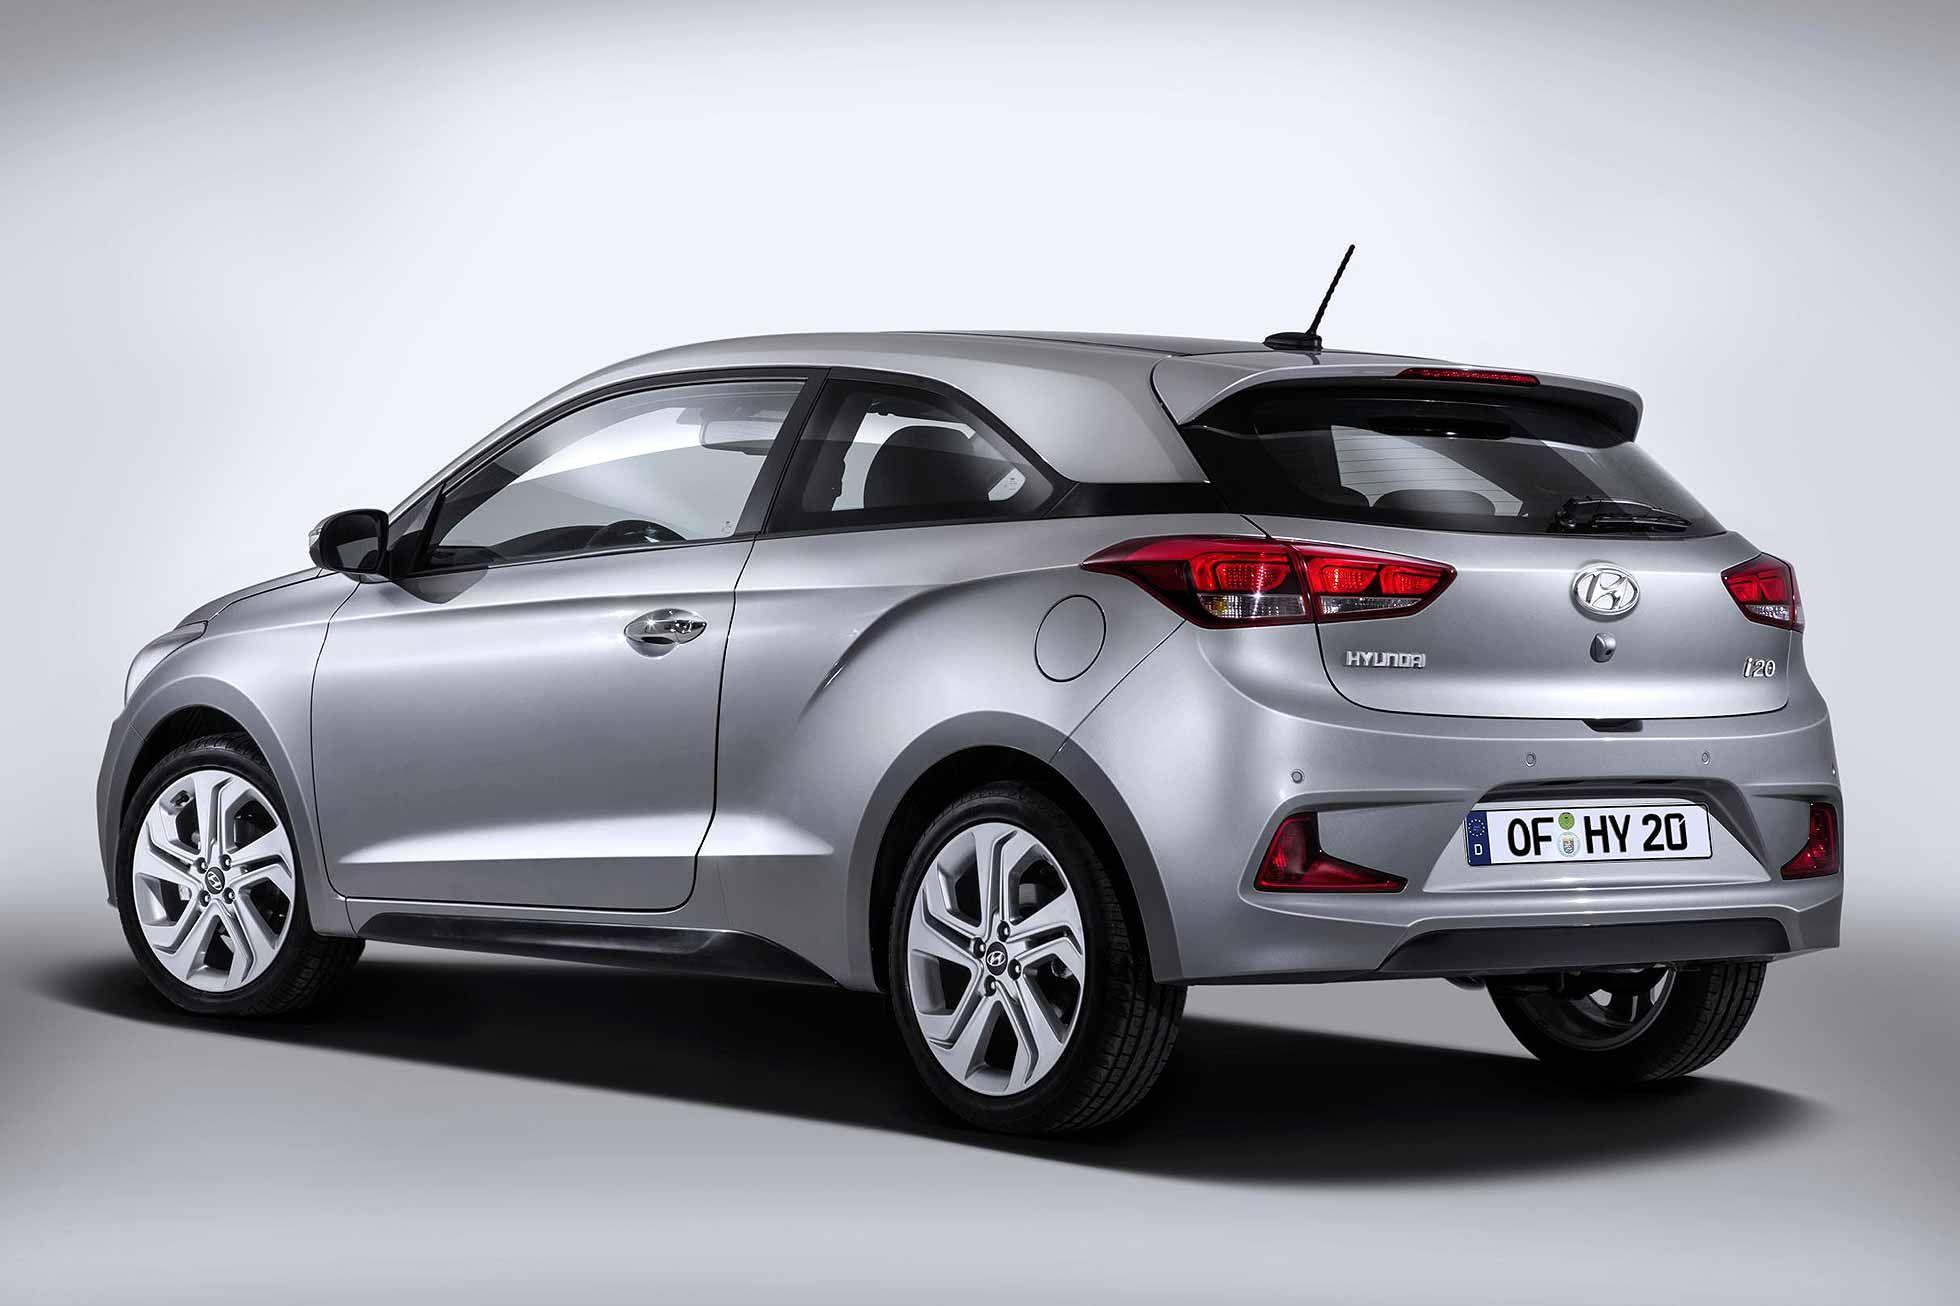 Hyundai I20 2015 Model Cool Cars 2246) Wallpaper